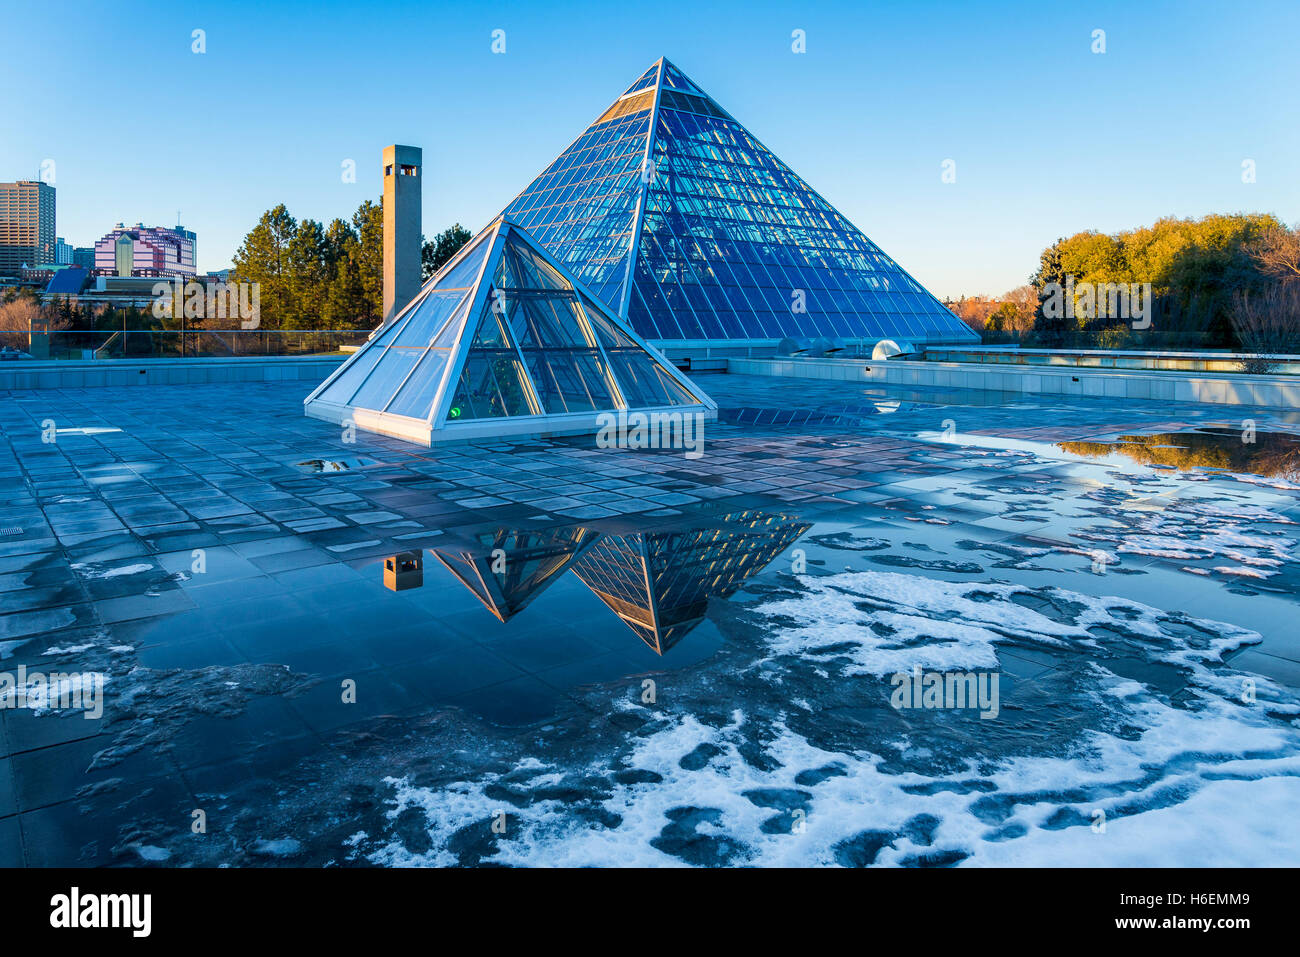 Muttart Conservatory pyramids, a Botanical Garden in Edmonton, Alberta, Canada - Stock Image